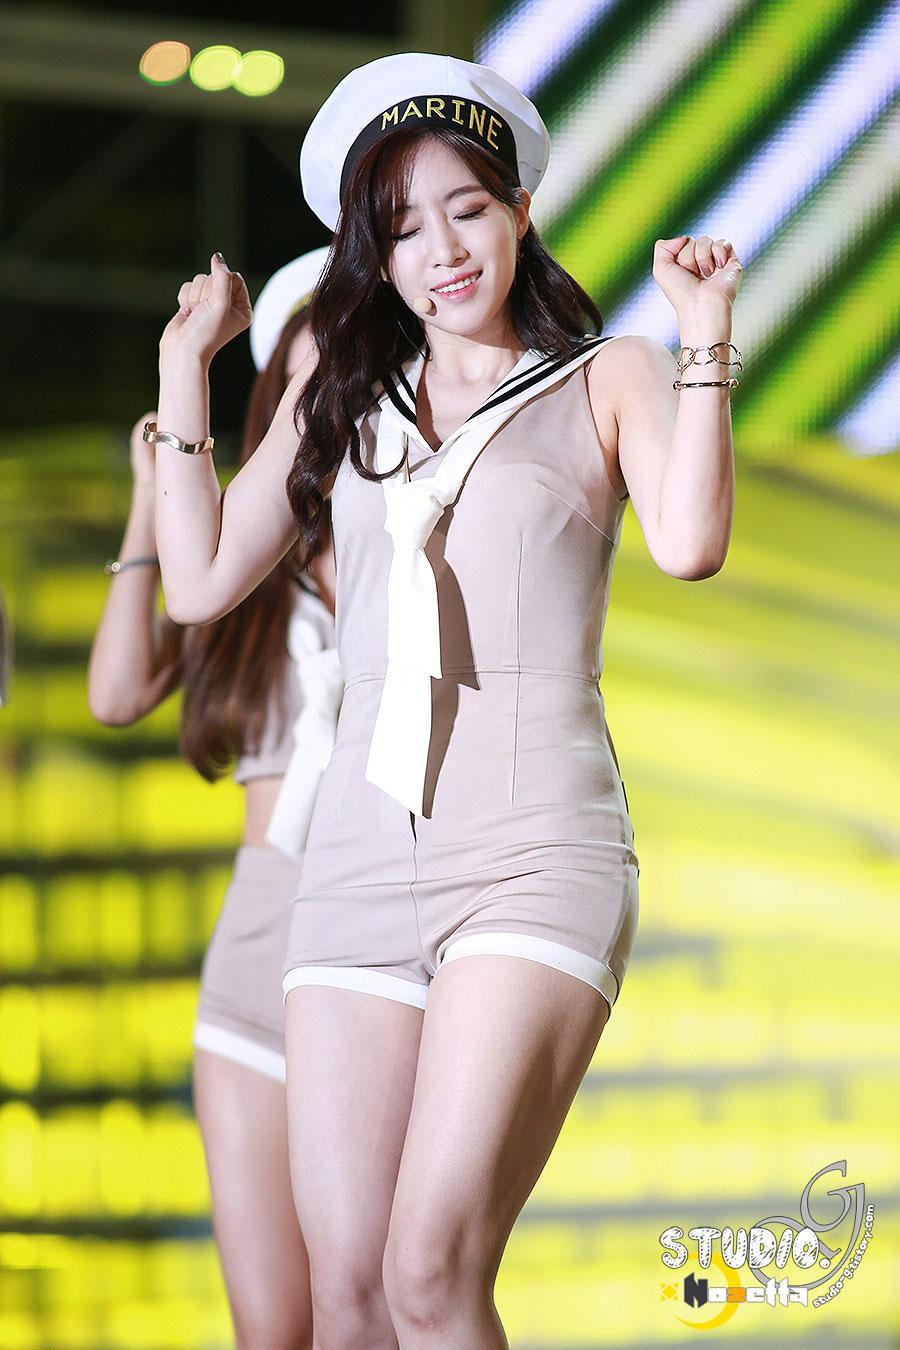 Tara Eunjung Marine style performance